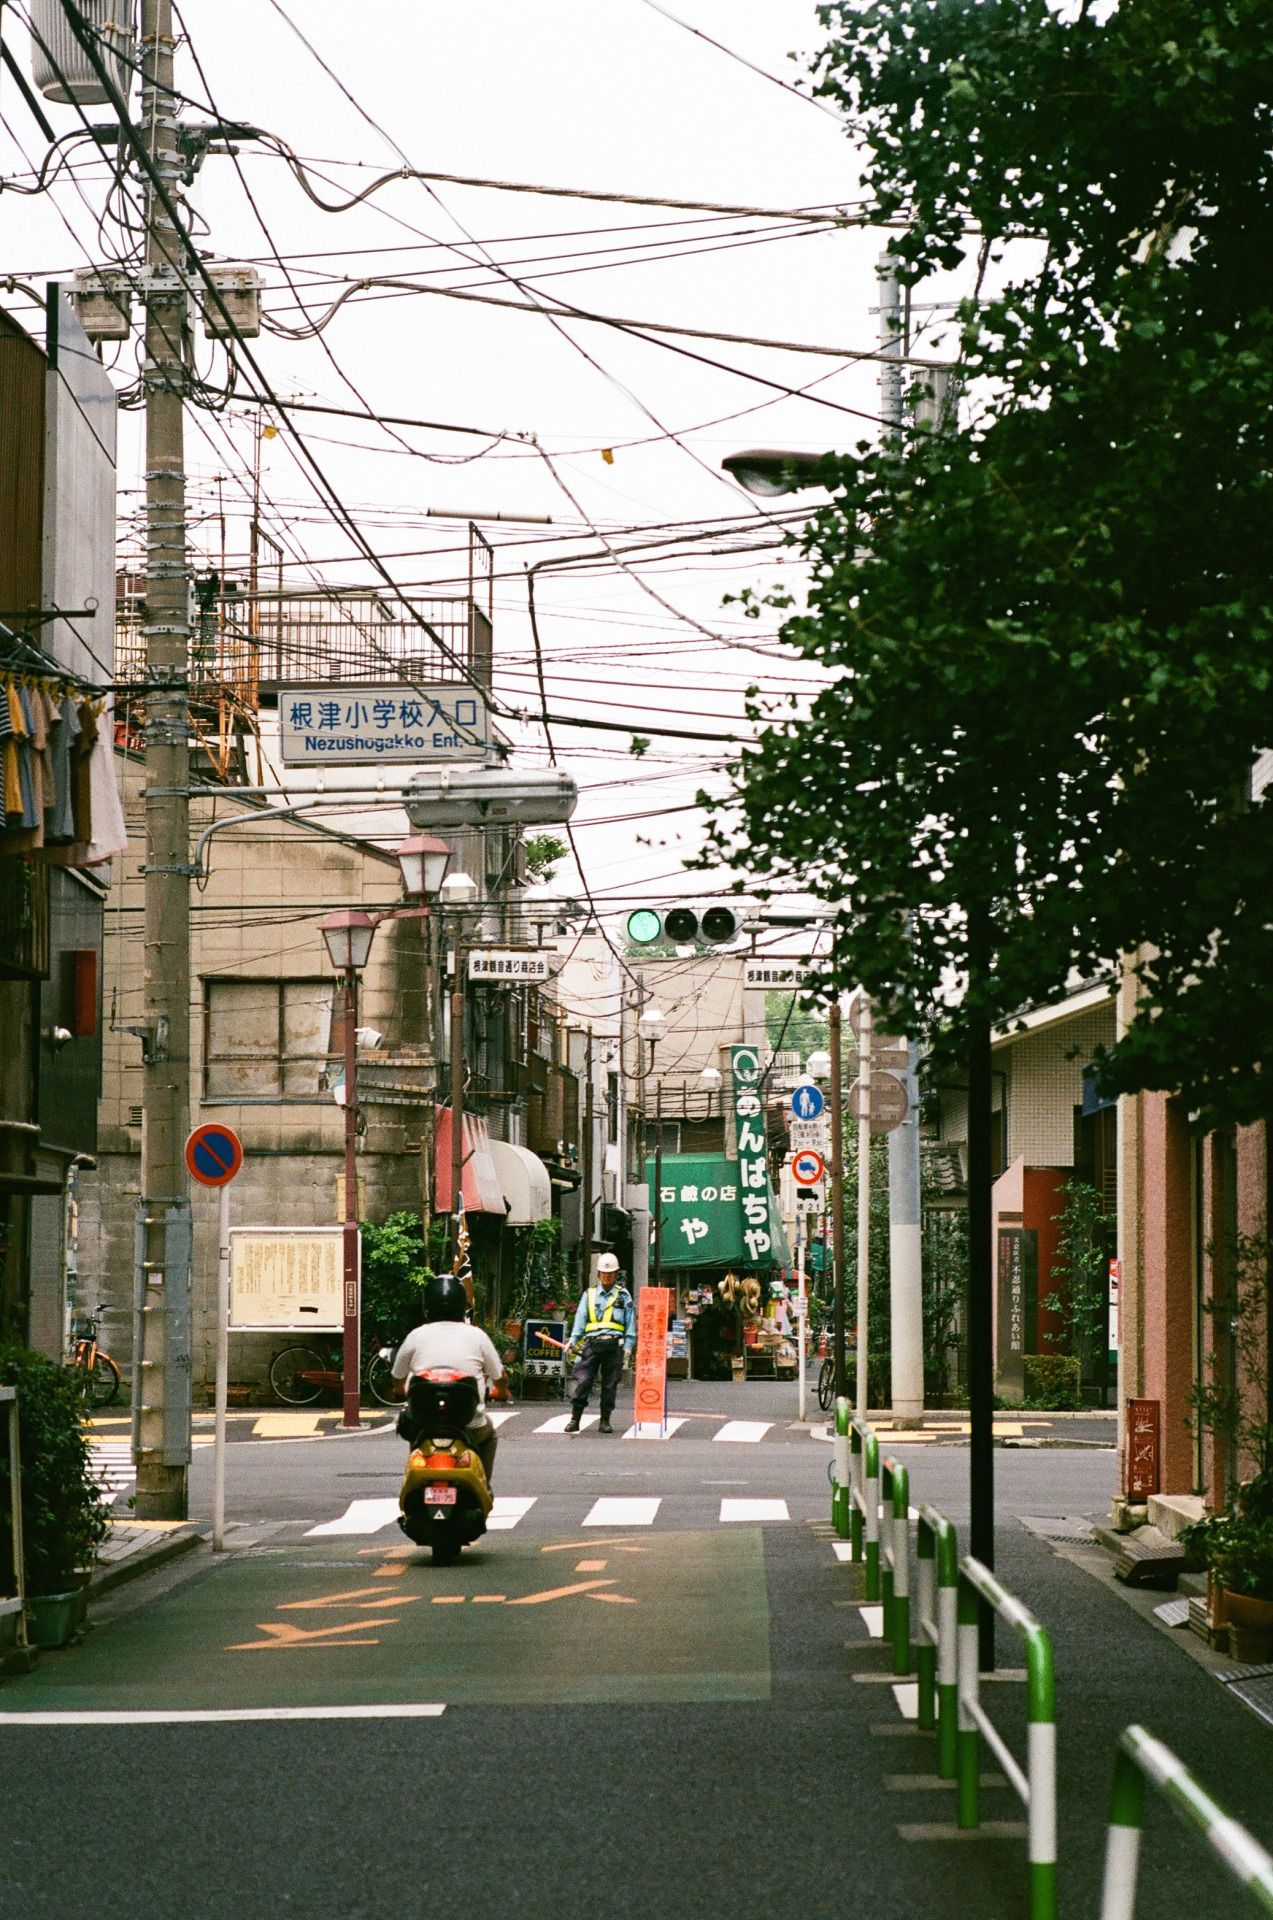 JAPANESE SUBURBIA zyu10 Tokyo, Japan, 2015 都市景観, 風景, 風景写真